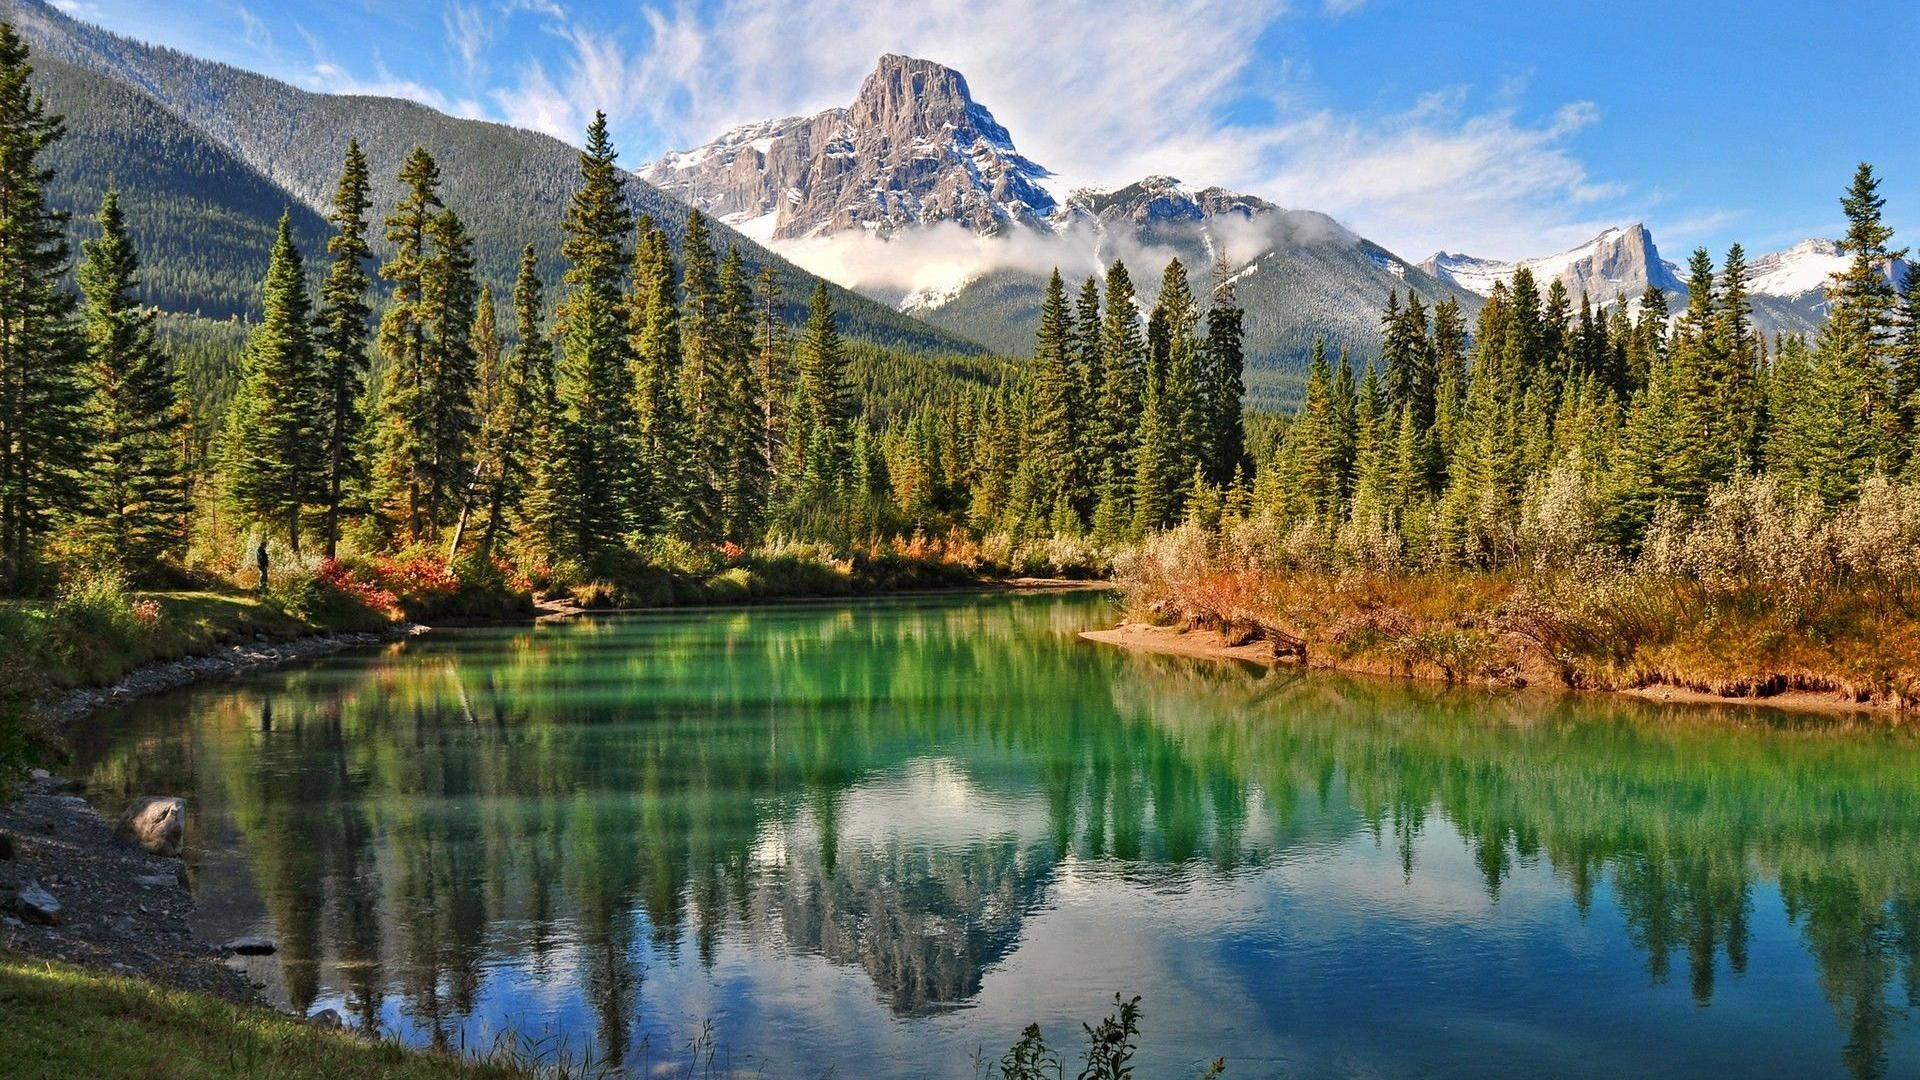 Nature Scenes Wallpapers Nature Scenes Hd Landscape Scenery Background